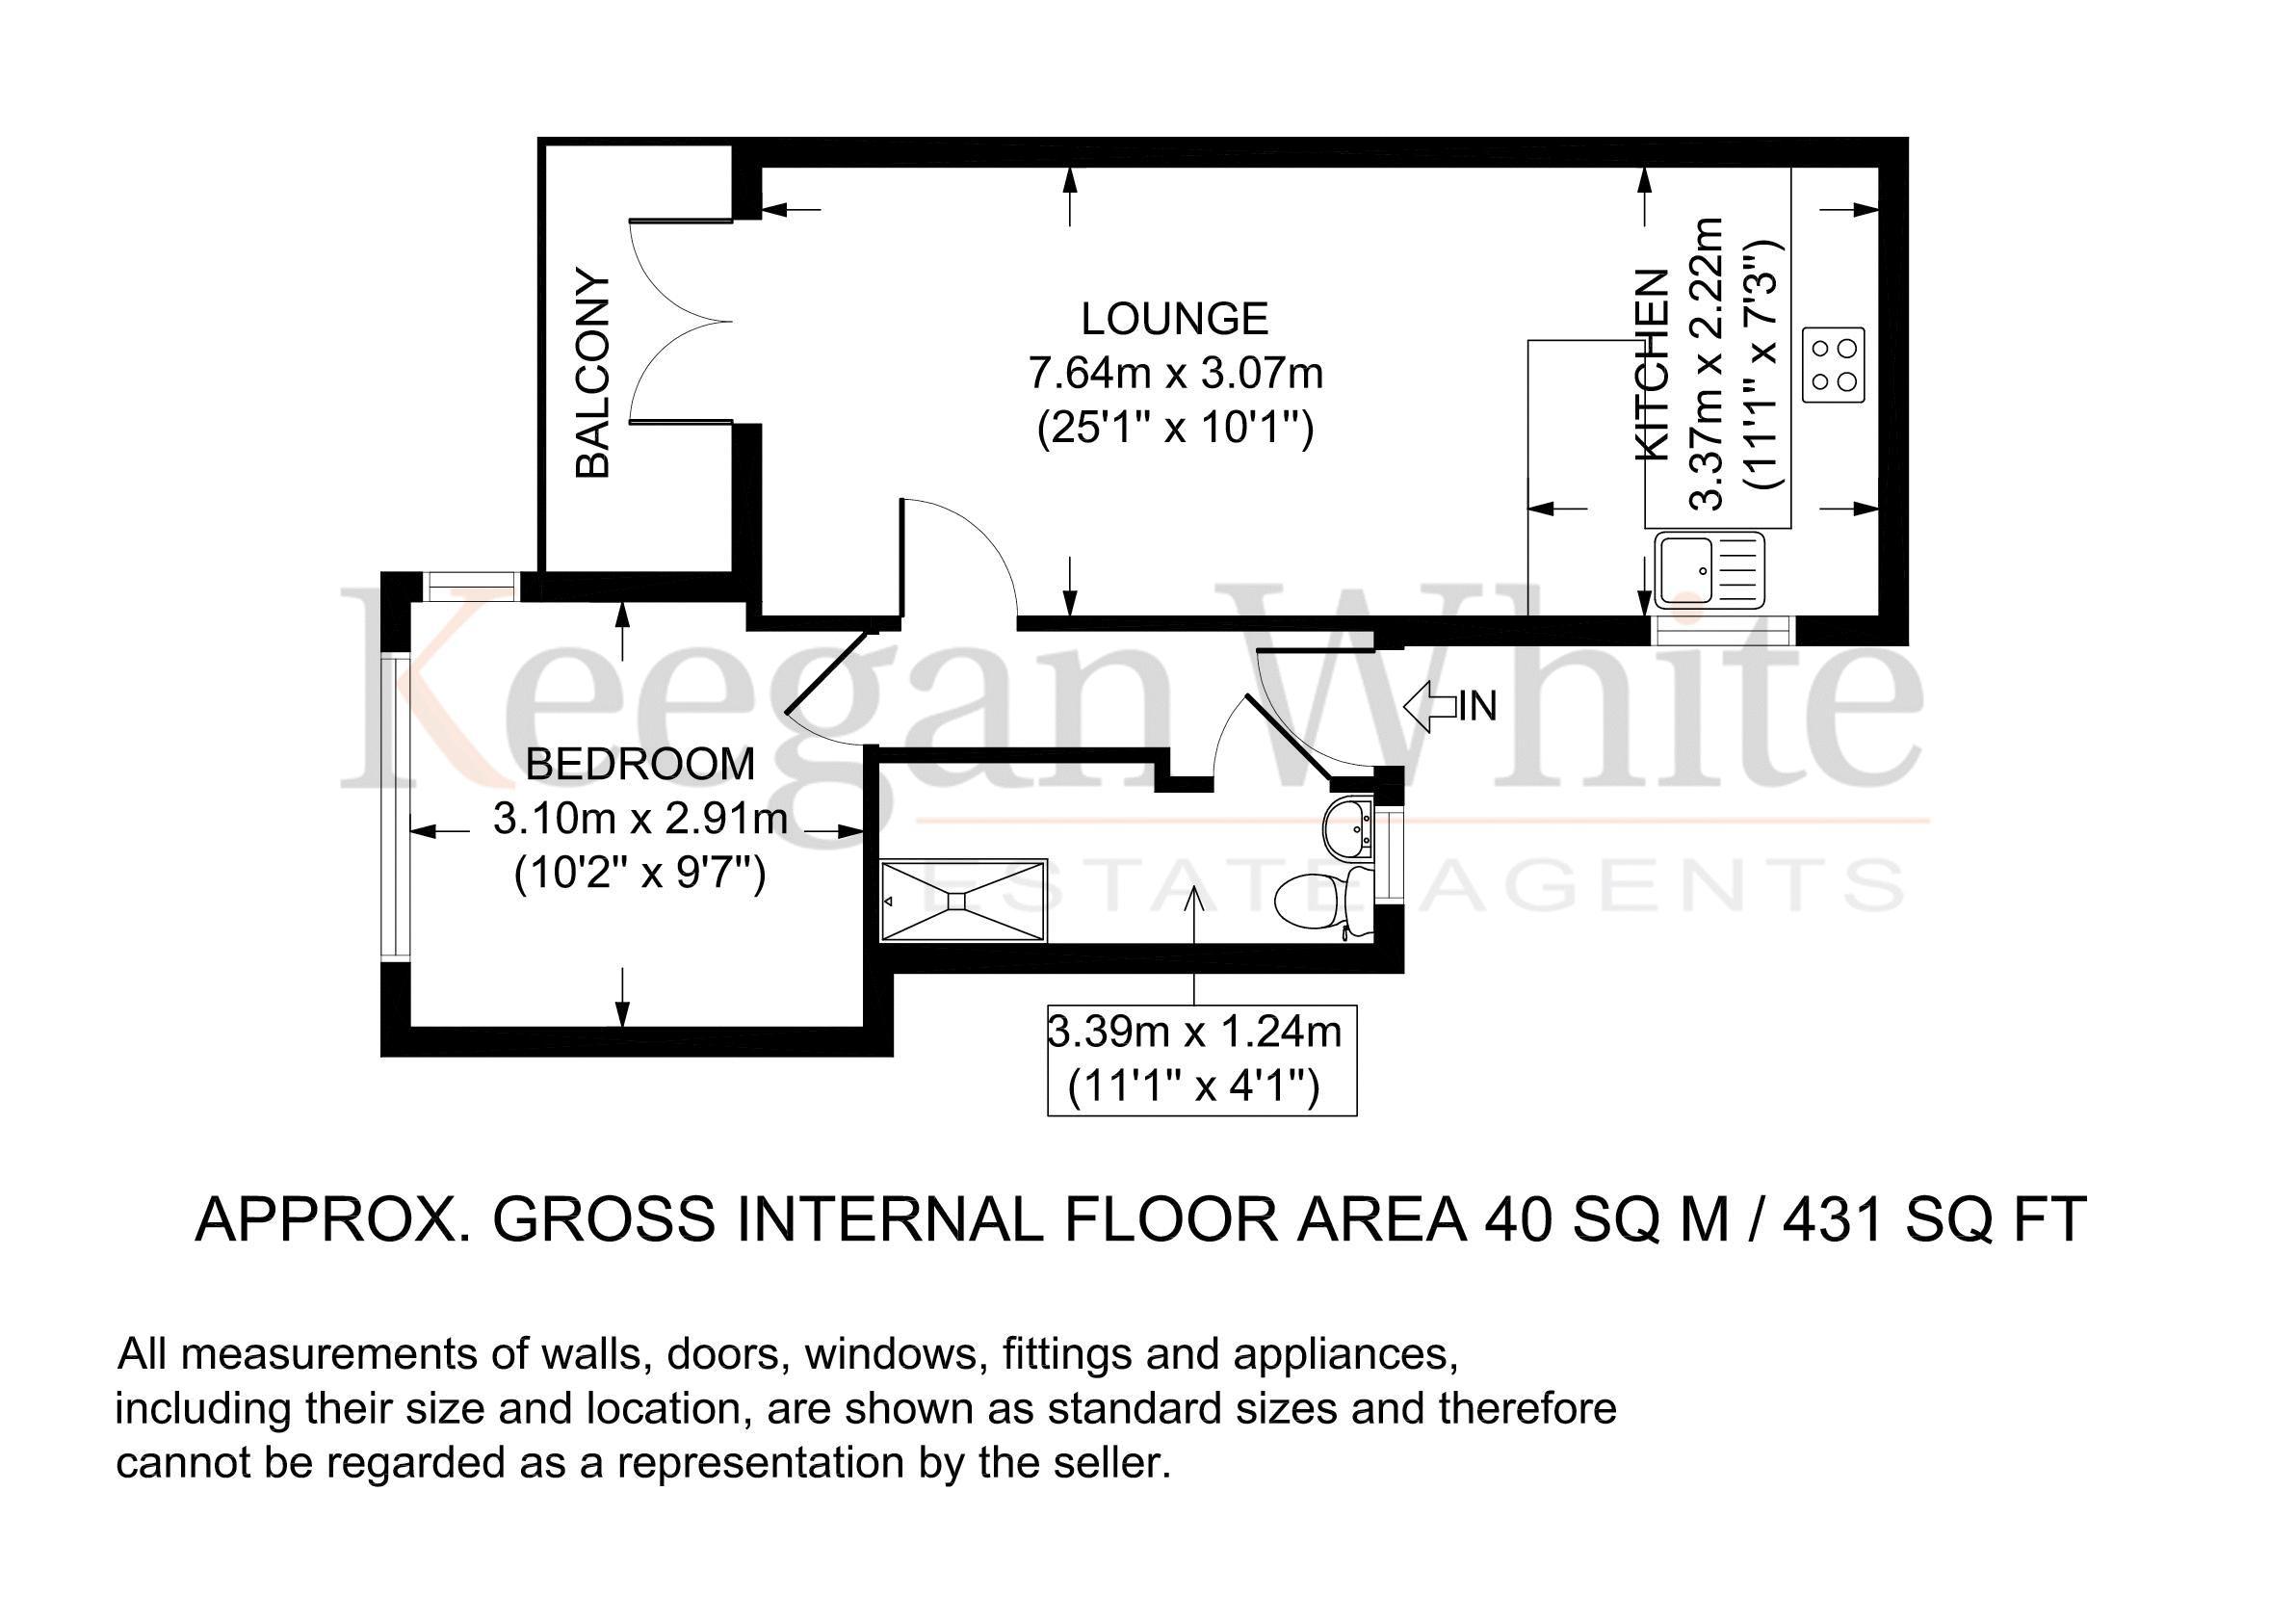 Keegan White - Plot 4 Pinions Road - Floorplan